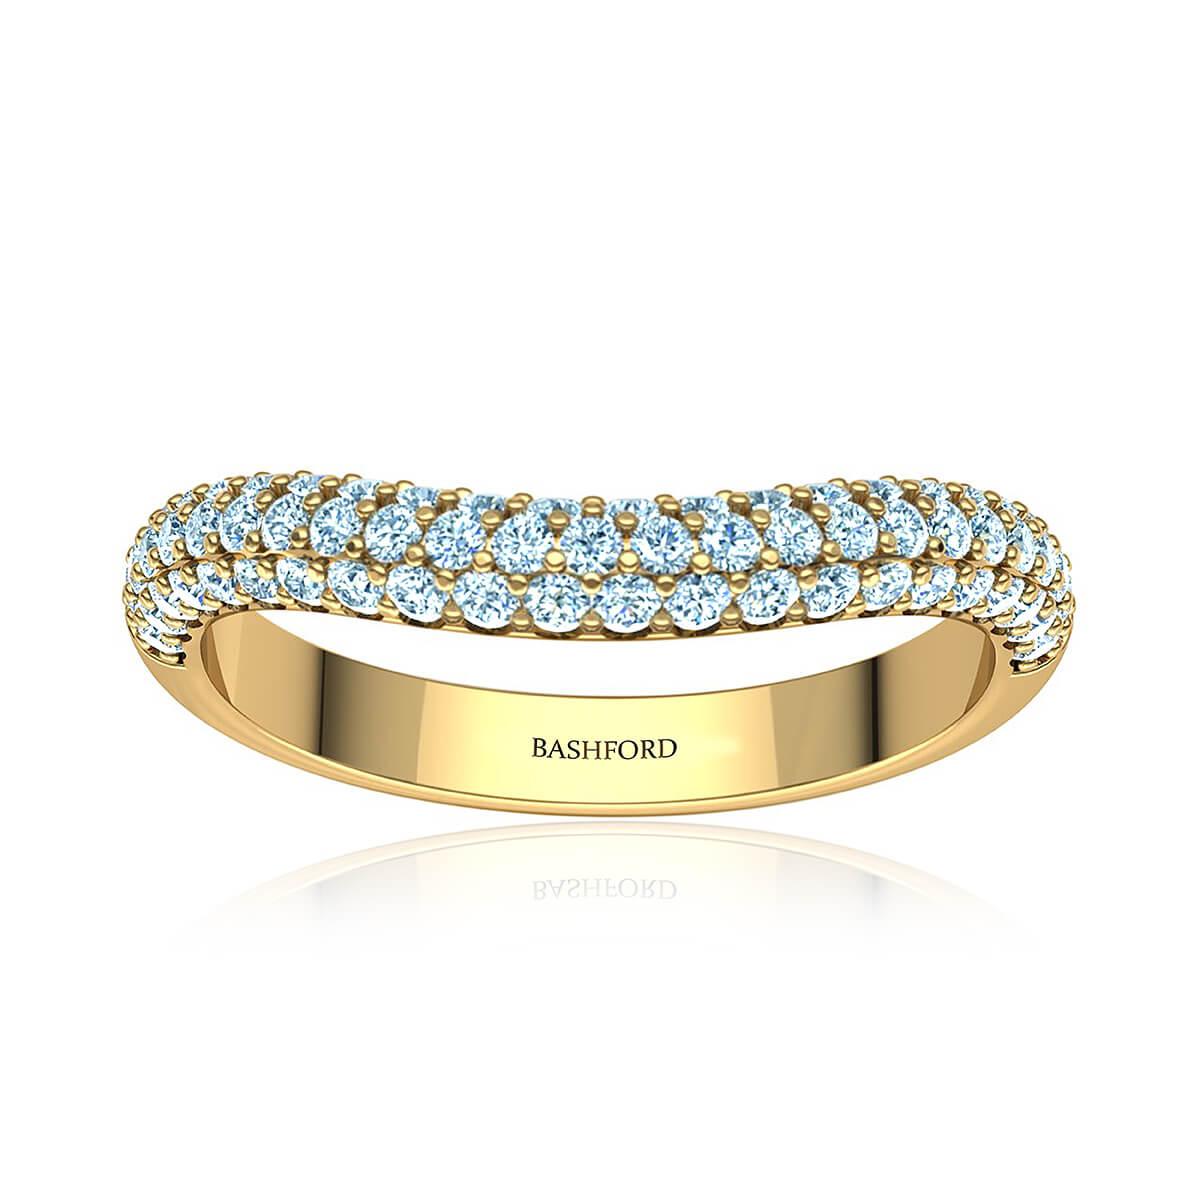 Harmonia Diamond Ring (1/2 CT. TW.)